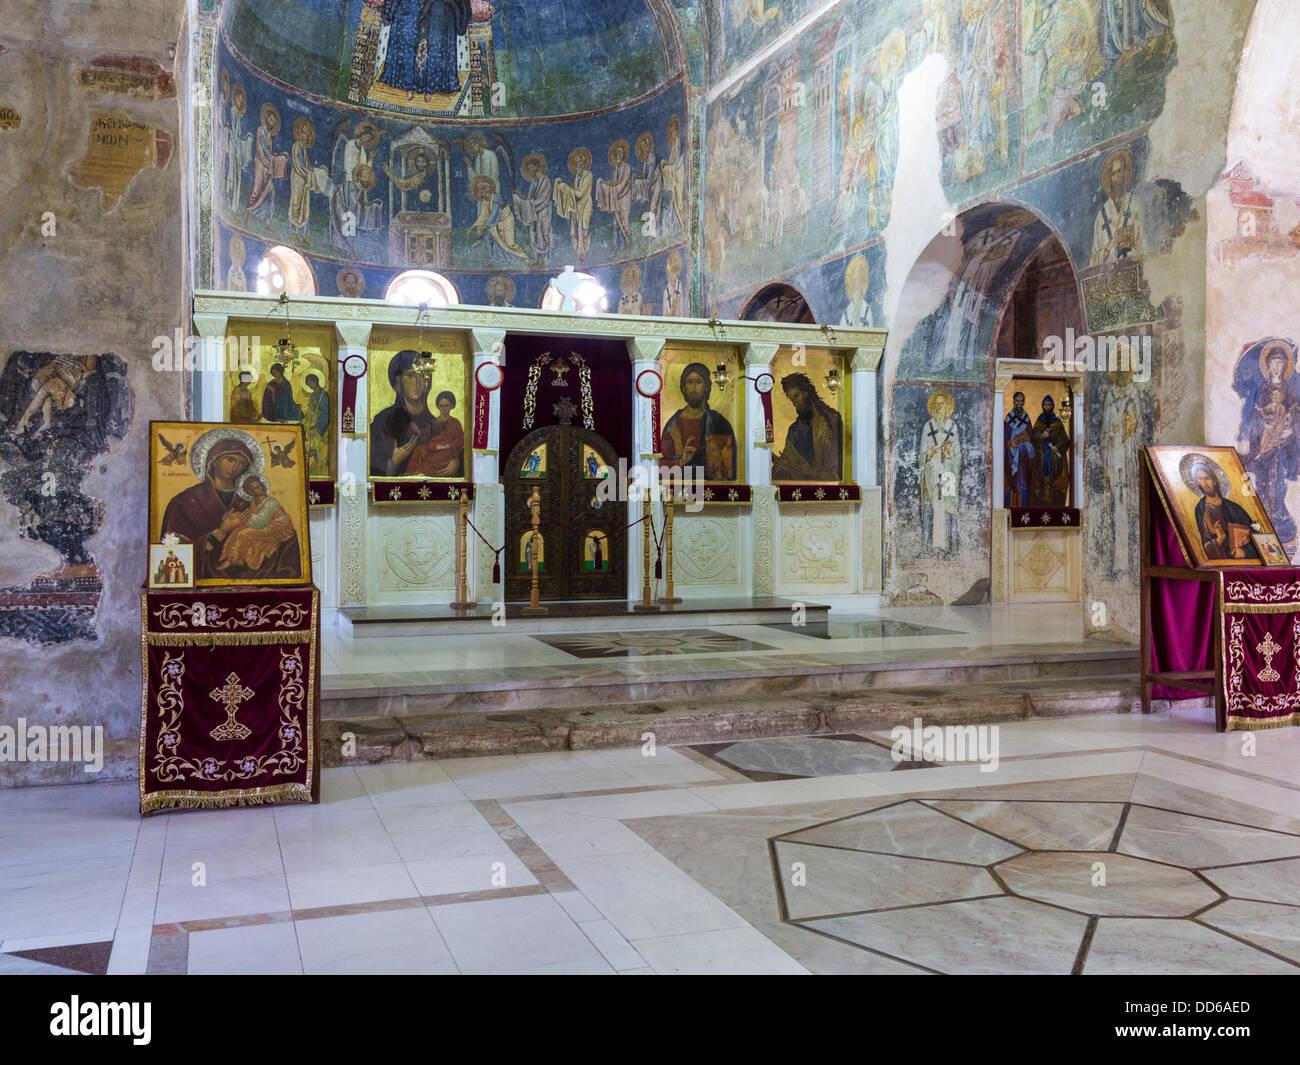 Inside Sveti Sofija Cathedral, Ohrid, Macedonia with religious icons and frescoes - Stock Image